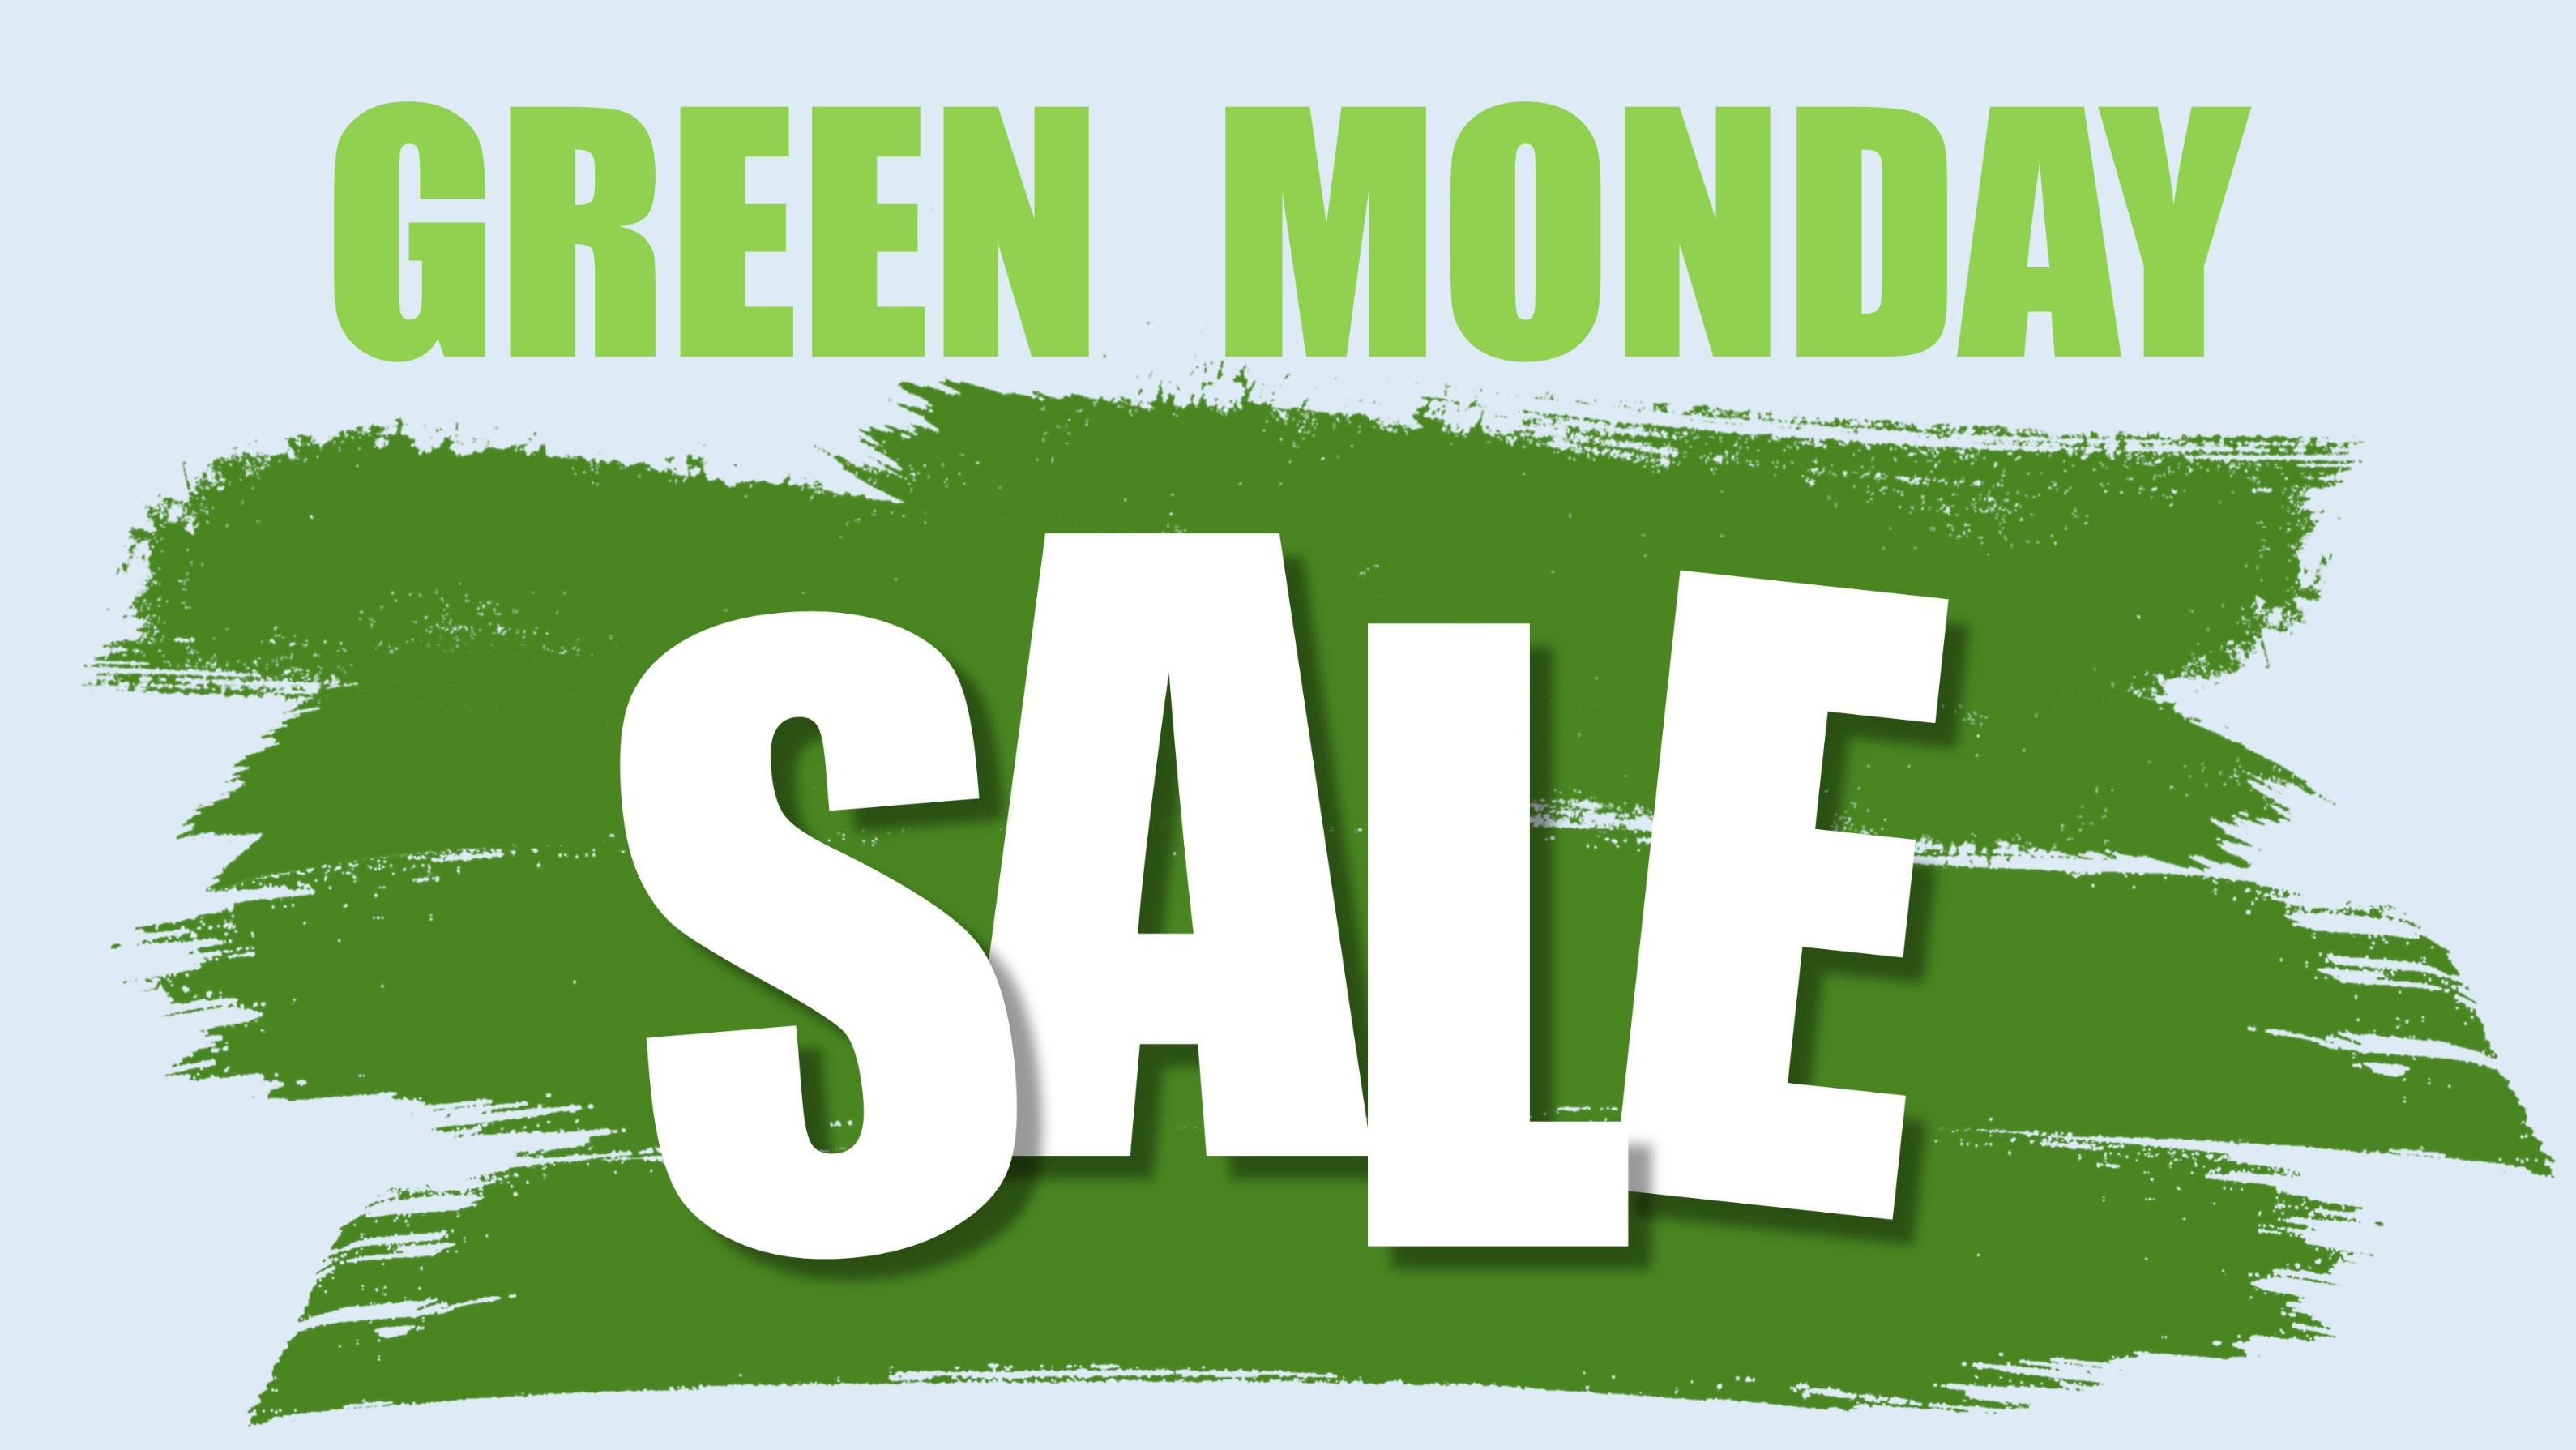 Green Monday deals 2019: the best sales from Amazon, Walmart, Best Buy & more